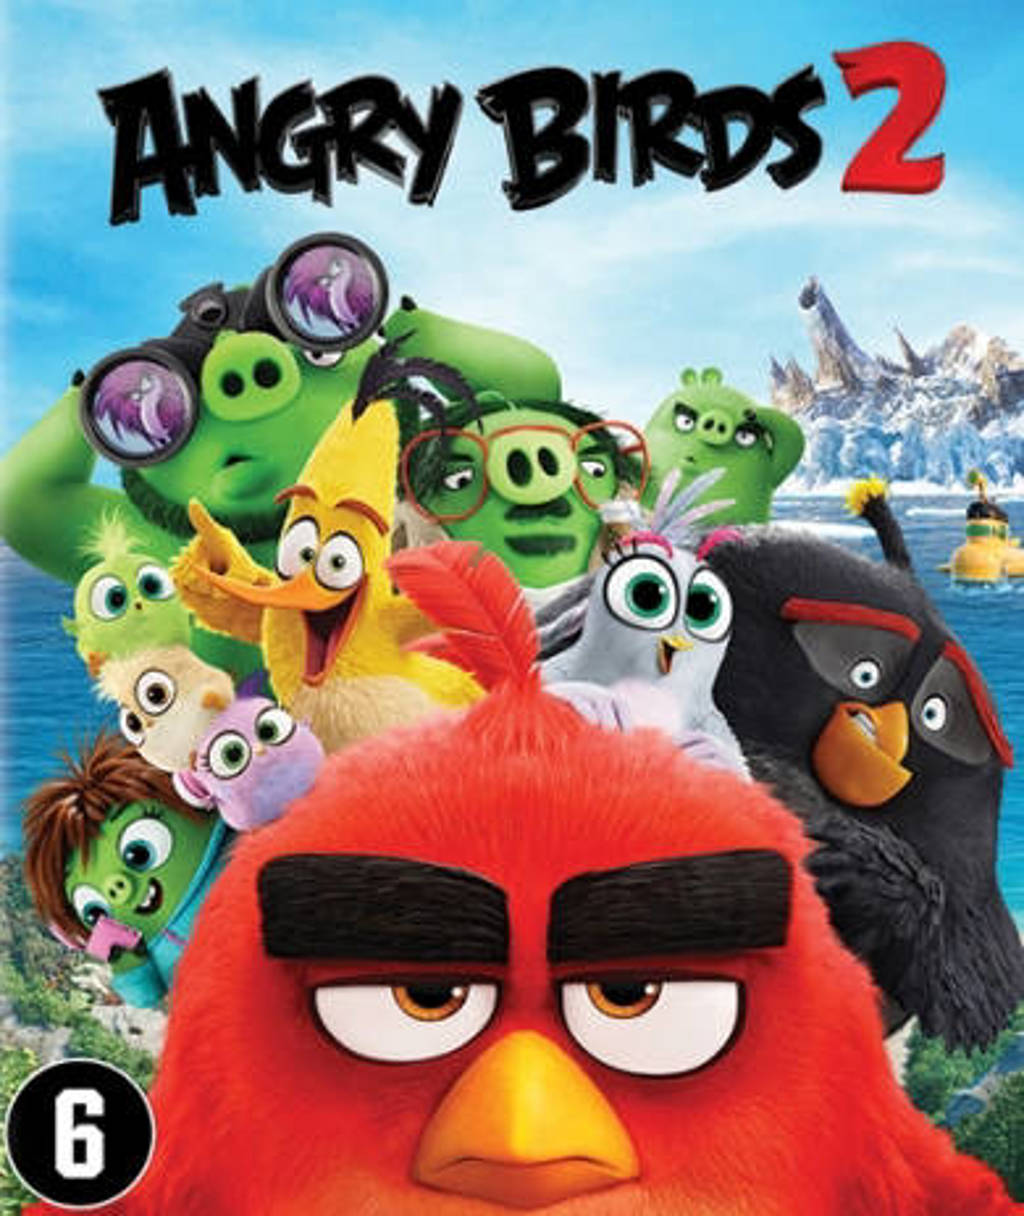 Angry birds movie 2 (BE) (Blu-ray)